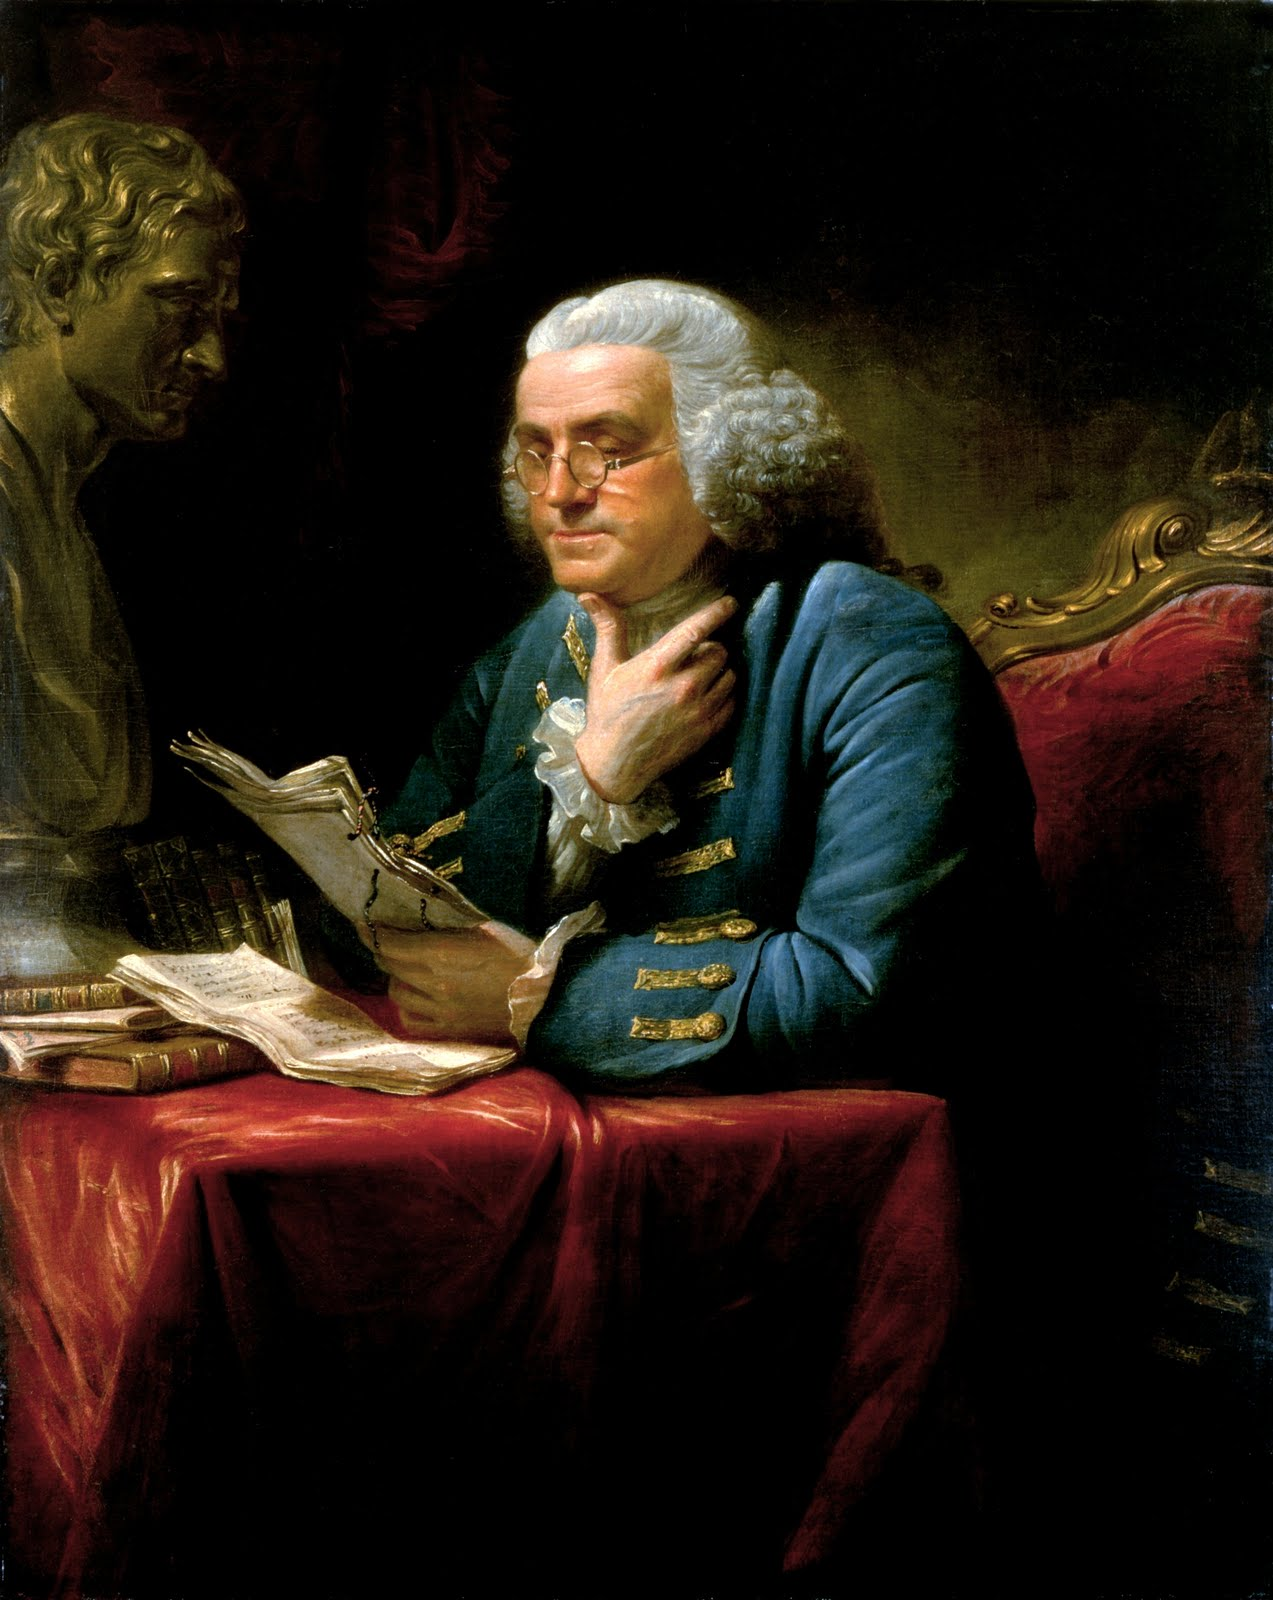 http://4.bp.blogspot.com/_J4kfpzqi8qw/TKkcEr-mZQI/AAAAAAAAAD0/IJpuq3JRnrY/s1600/Benjamin_Franklin_1767-1.jpeg